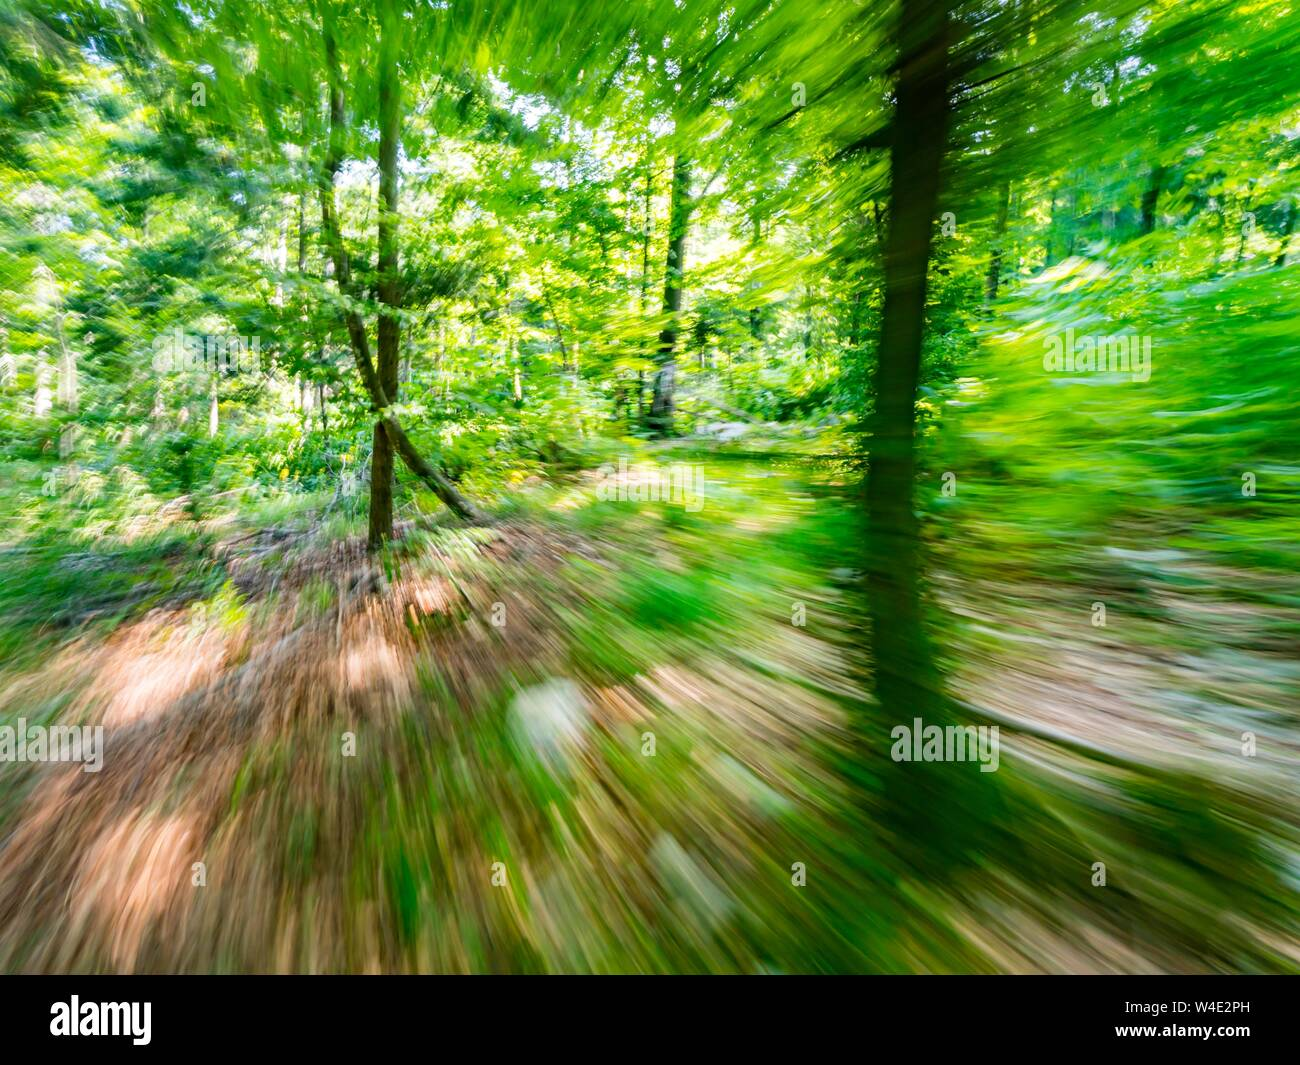 Green forest countryside speeding through dense trees natural environment Stock Photo